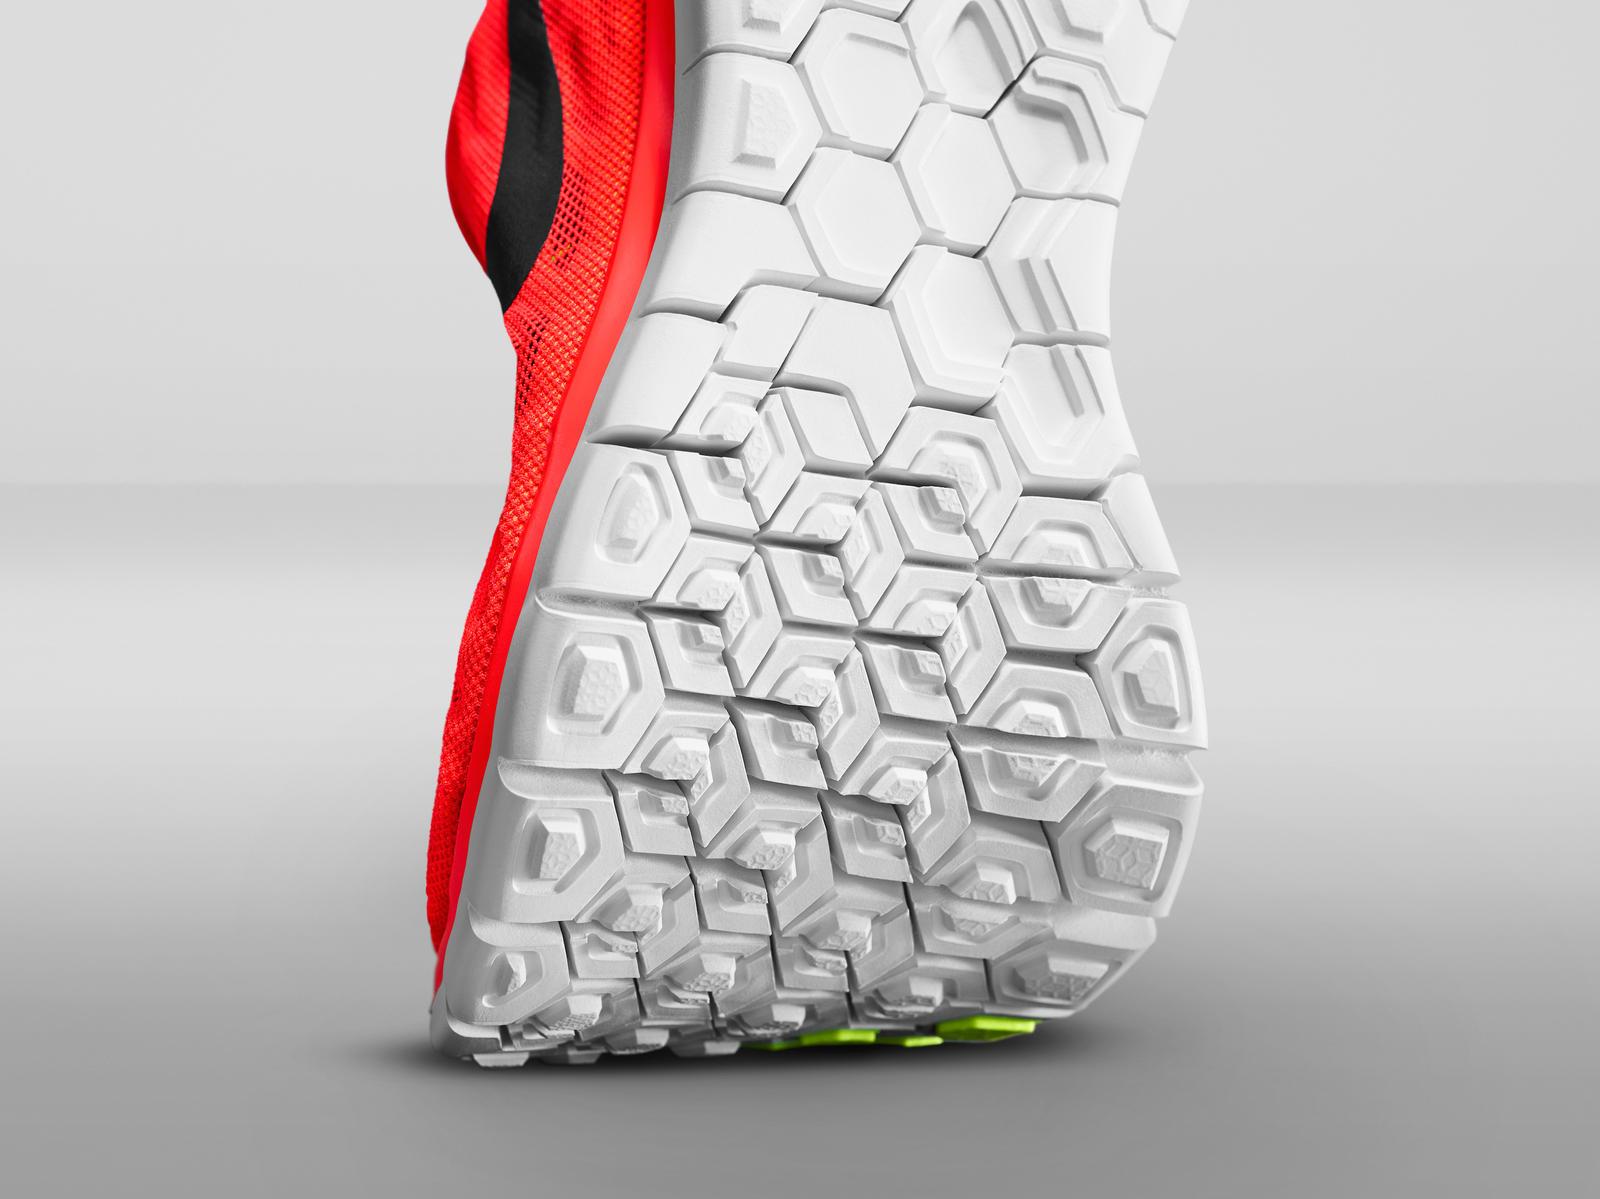 new styles a6129 26984 Su15 Rn M Free 5 0 Detail 5